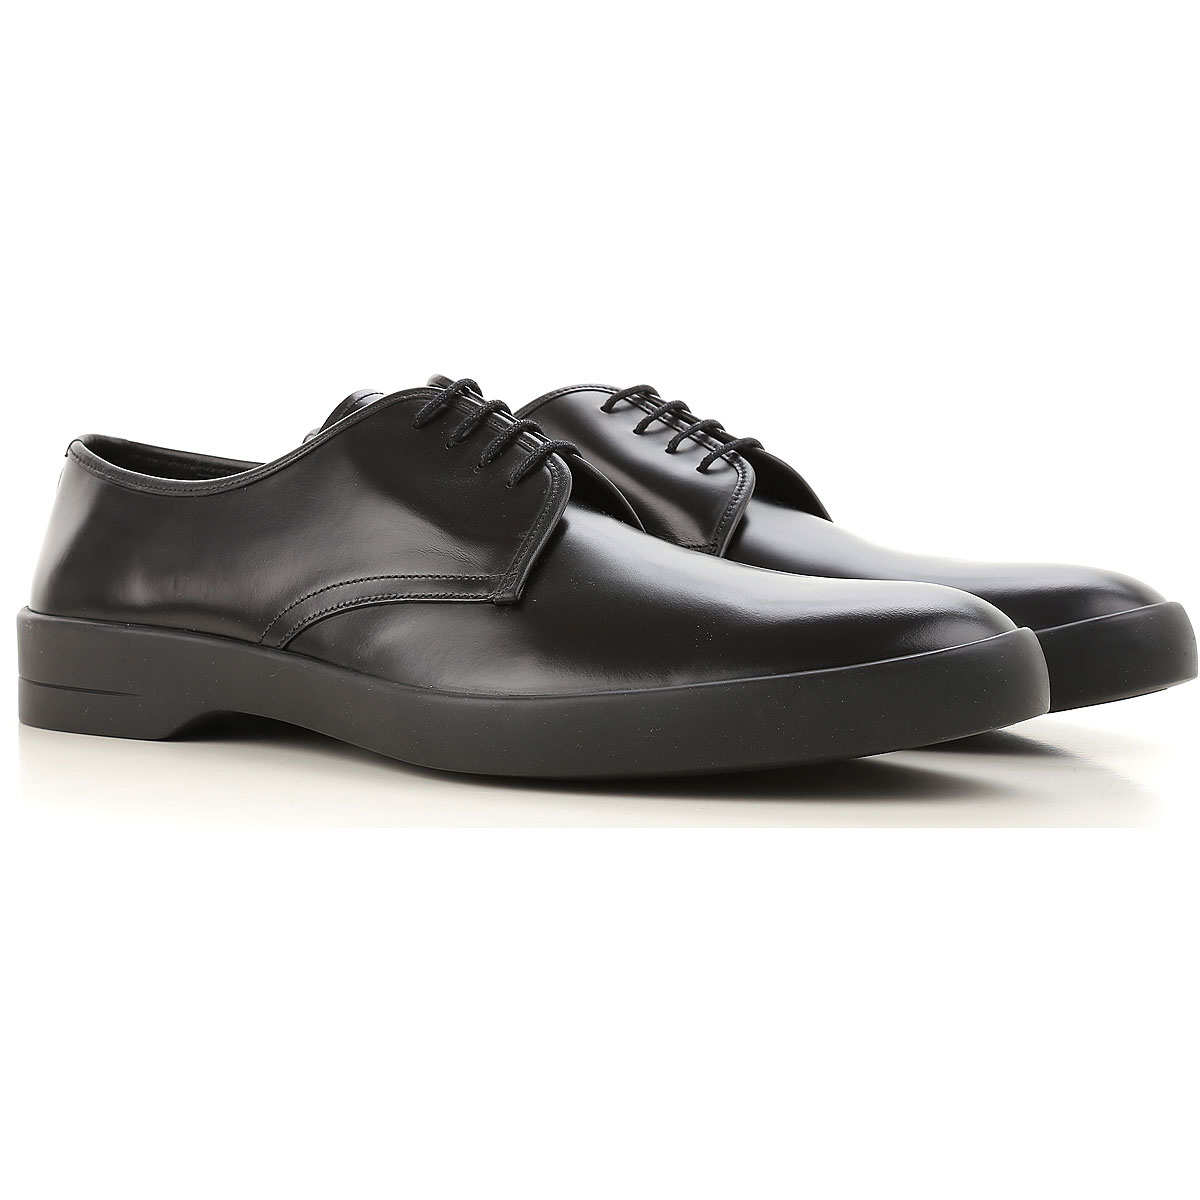 Prada Zapatos con Hombre Cordones para Hombre con raffaellonetwork Cordones 559a7b